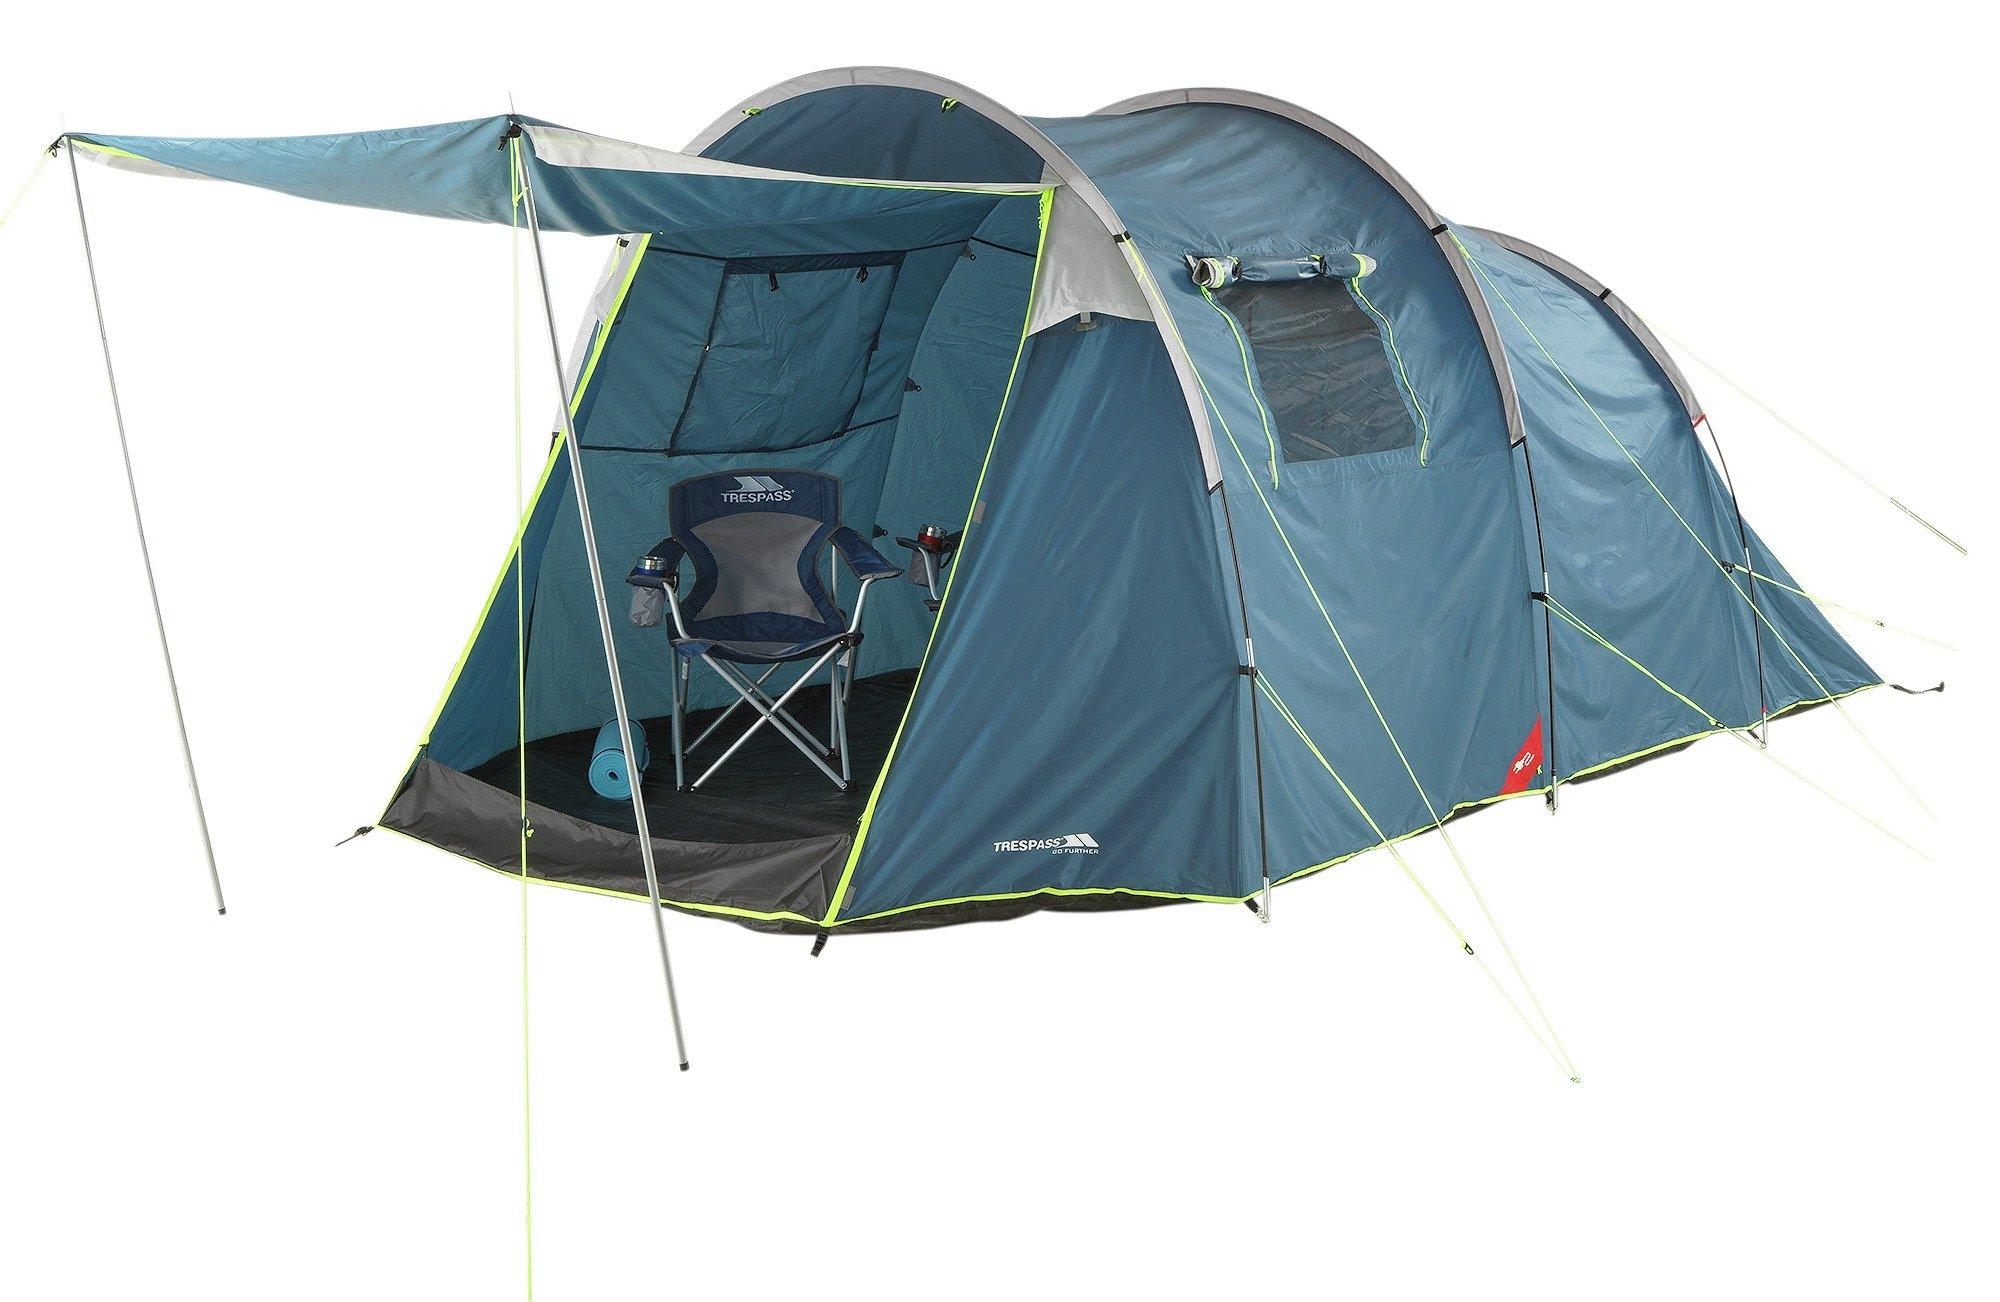 Trespass 4 Man Tent with Carpet lowest price